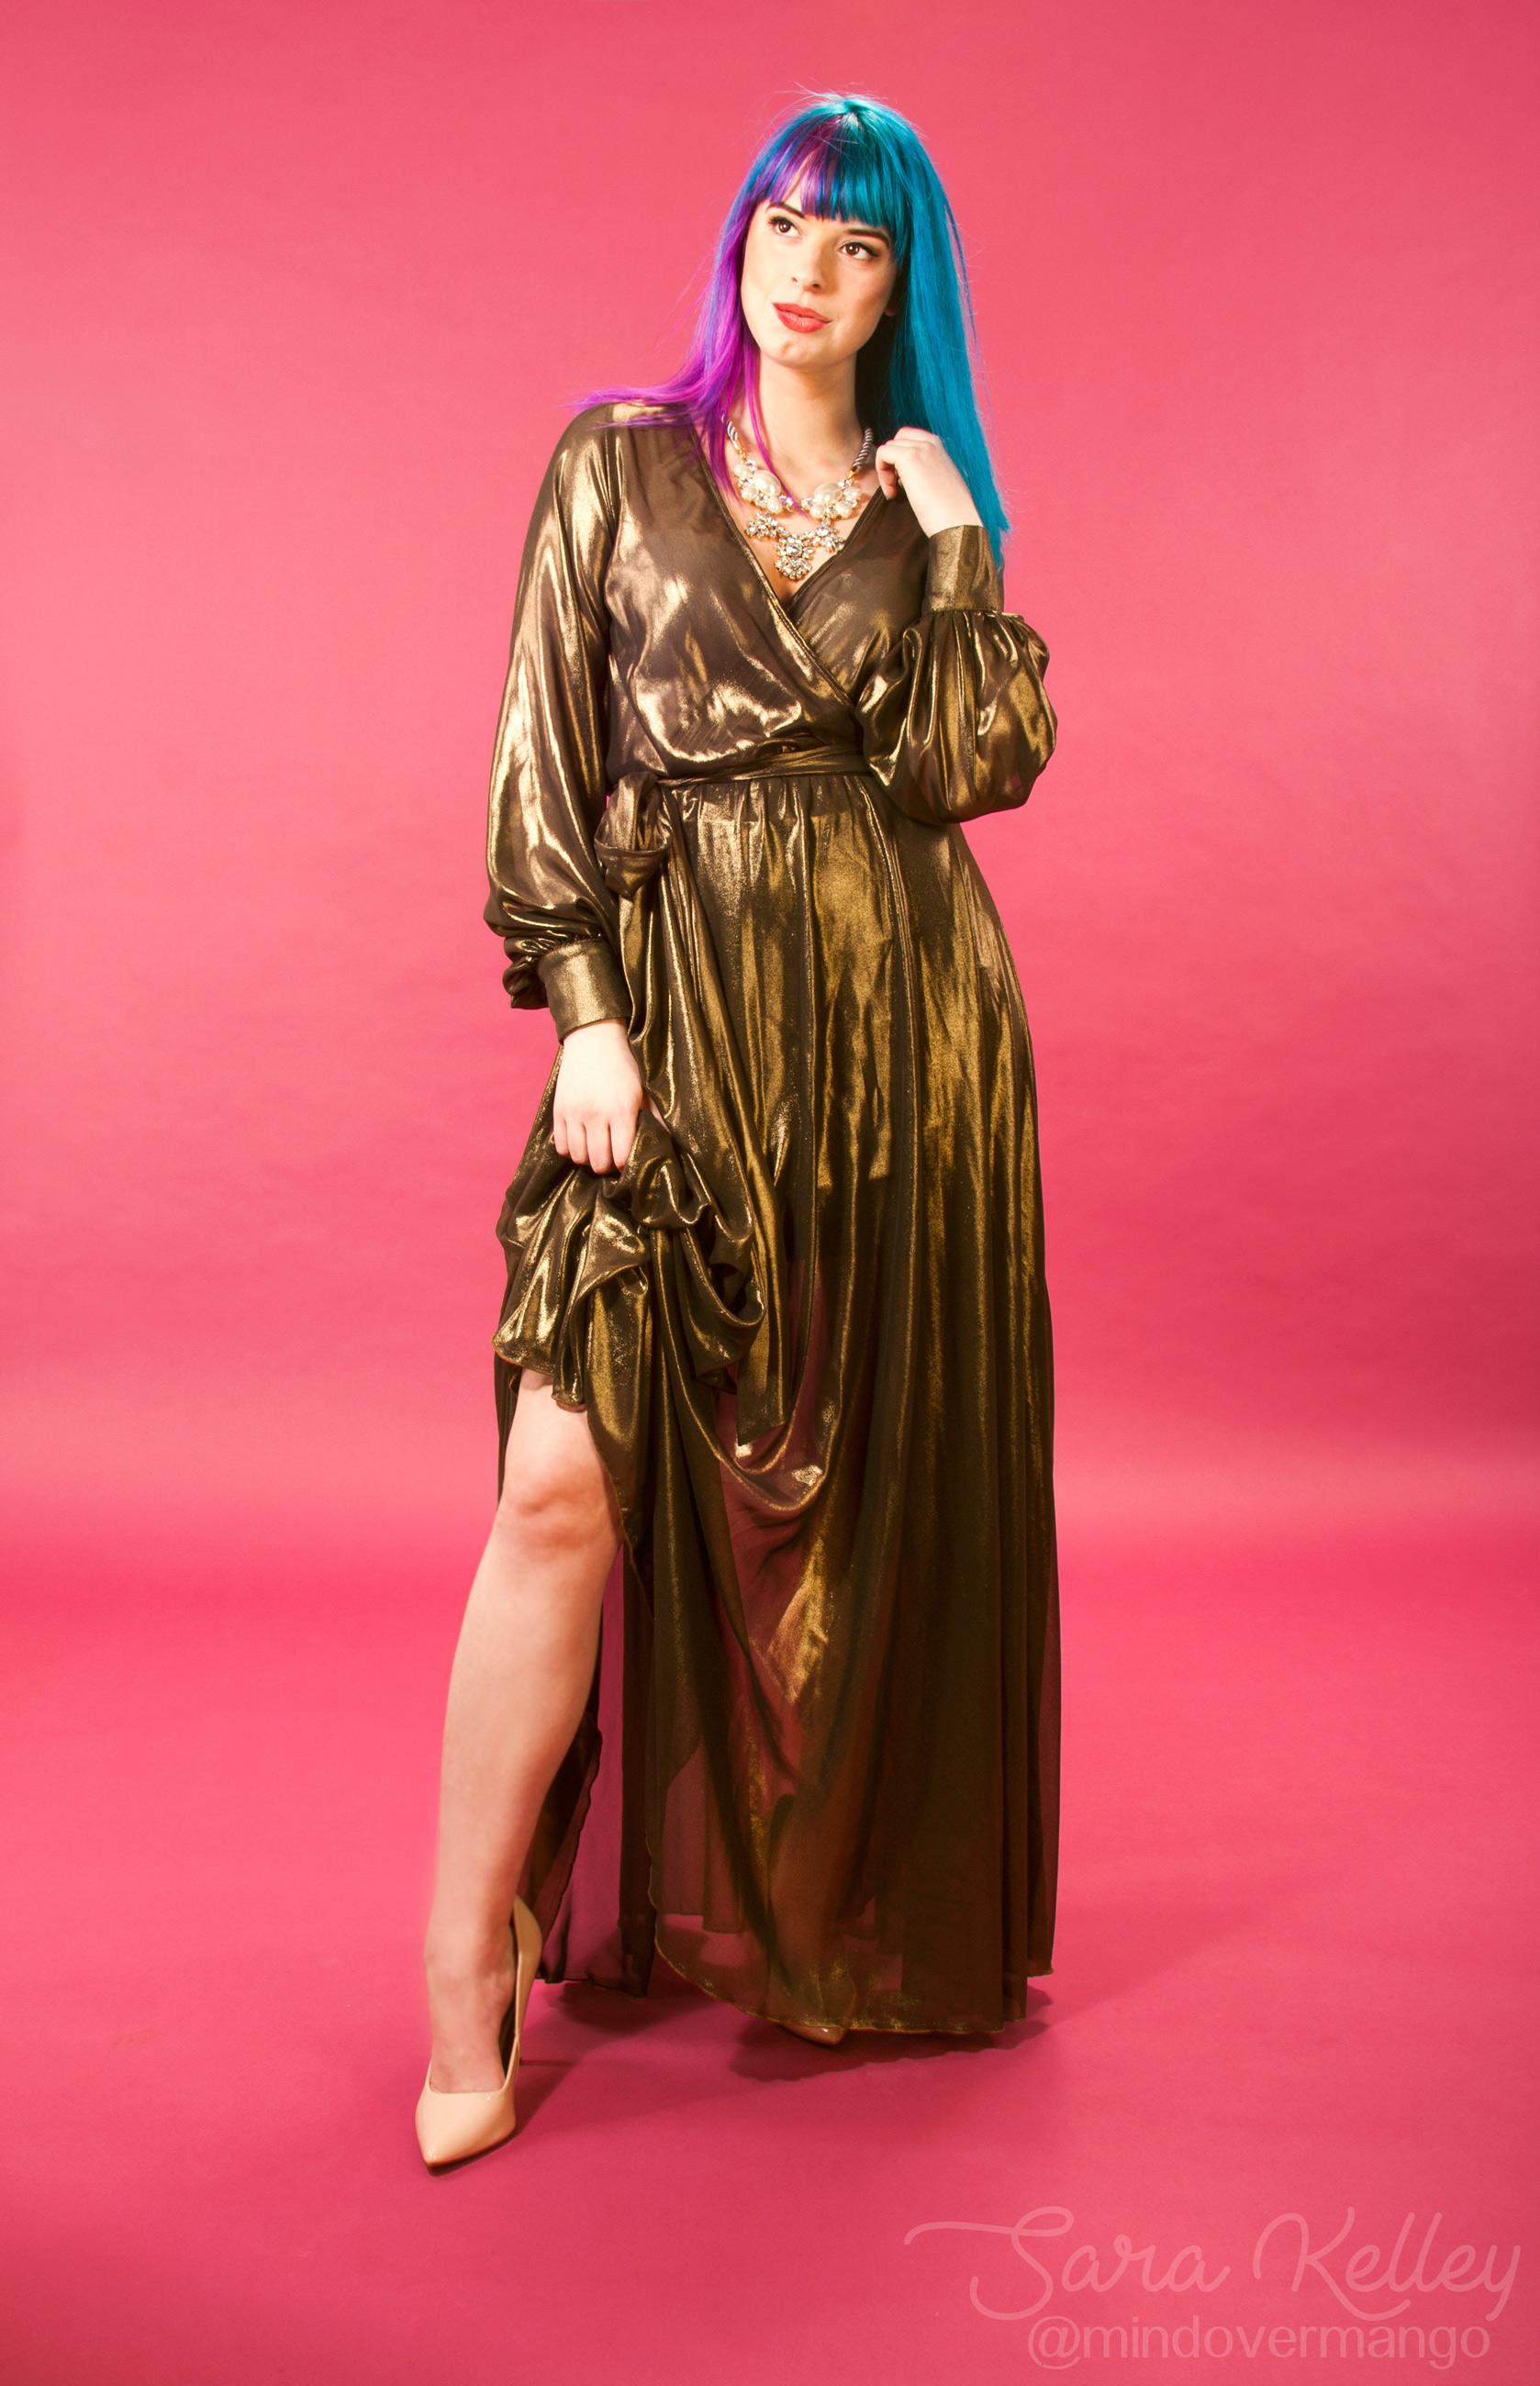 Modeling Autumn Hawk Loren Dress Model Photoshoot